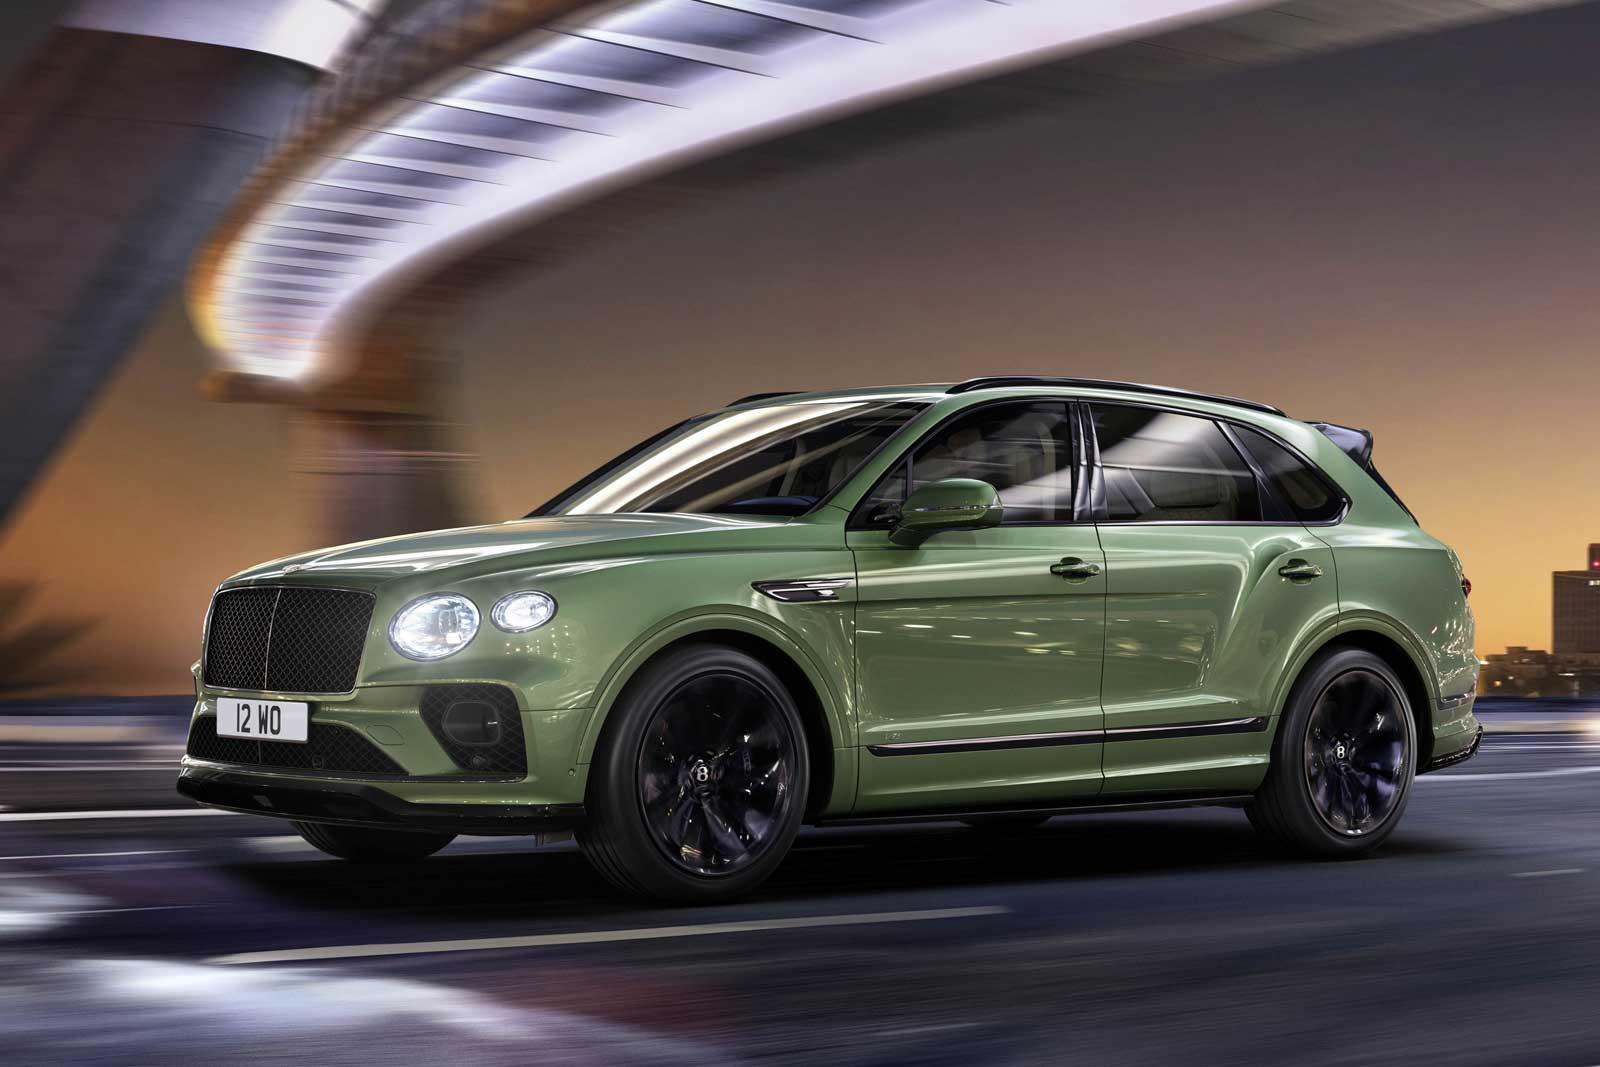 2021 Bentley Bentayga Gets Refreshed Design New Tech Motor Illustrated